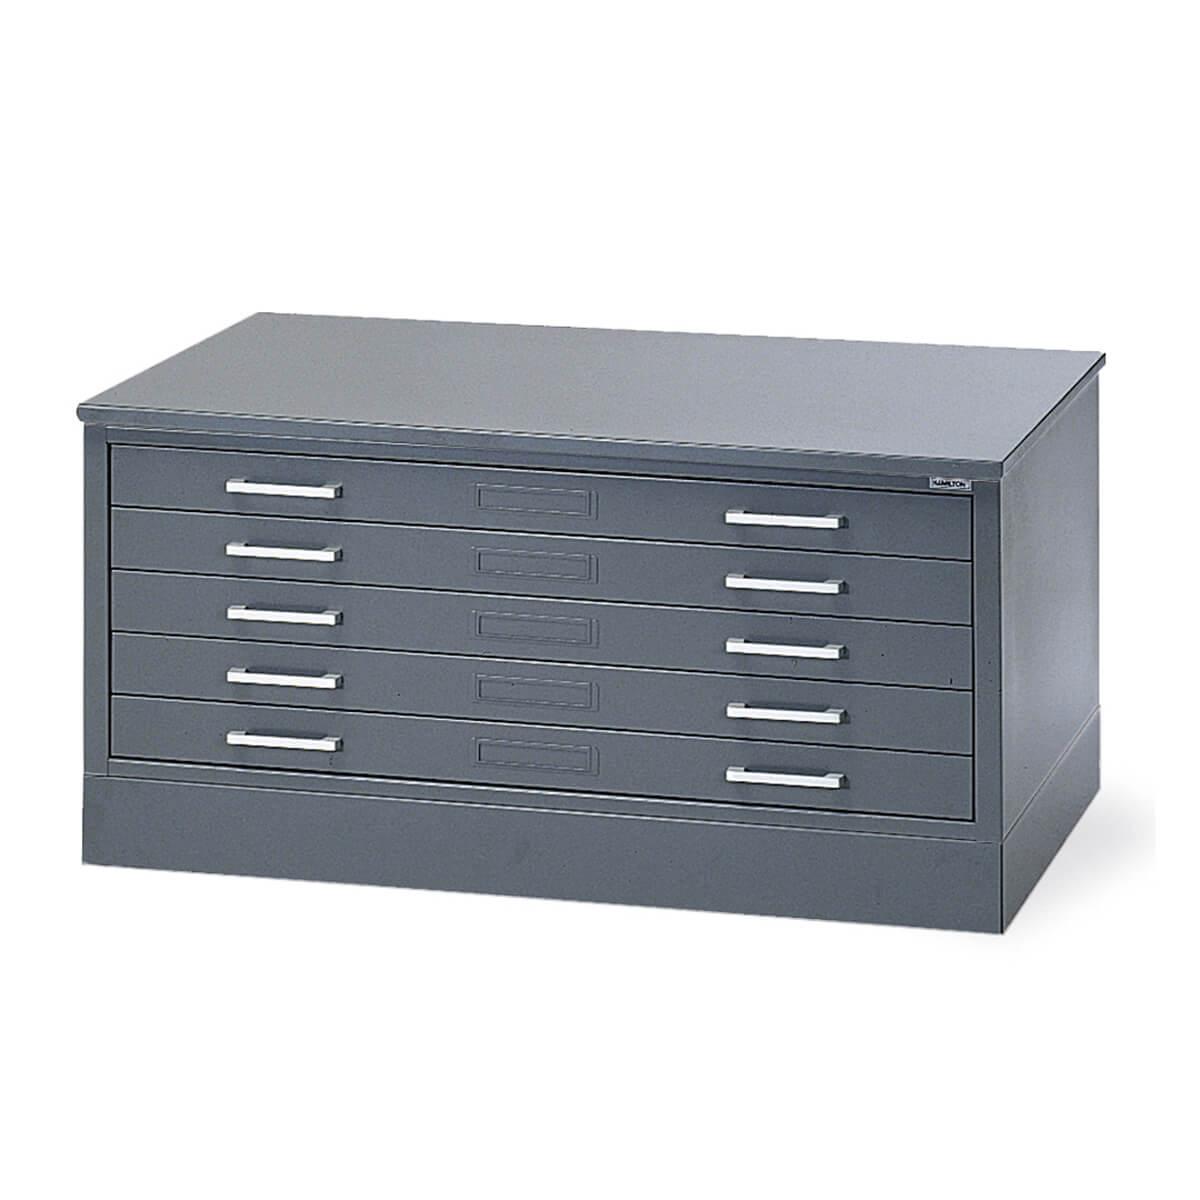 Superior Hamilton Flat File Cabinets By Mayline | TALAS